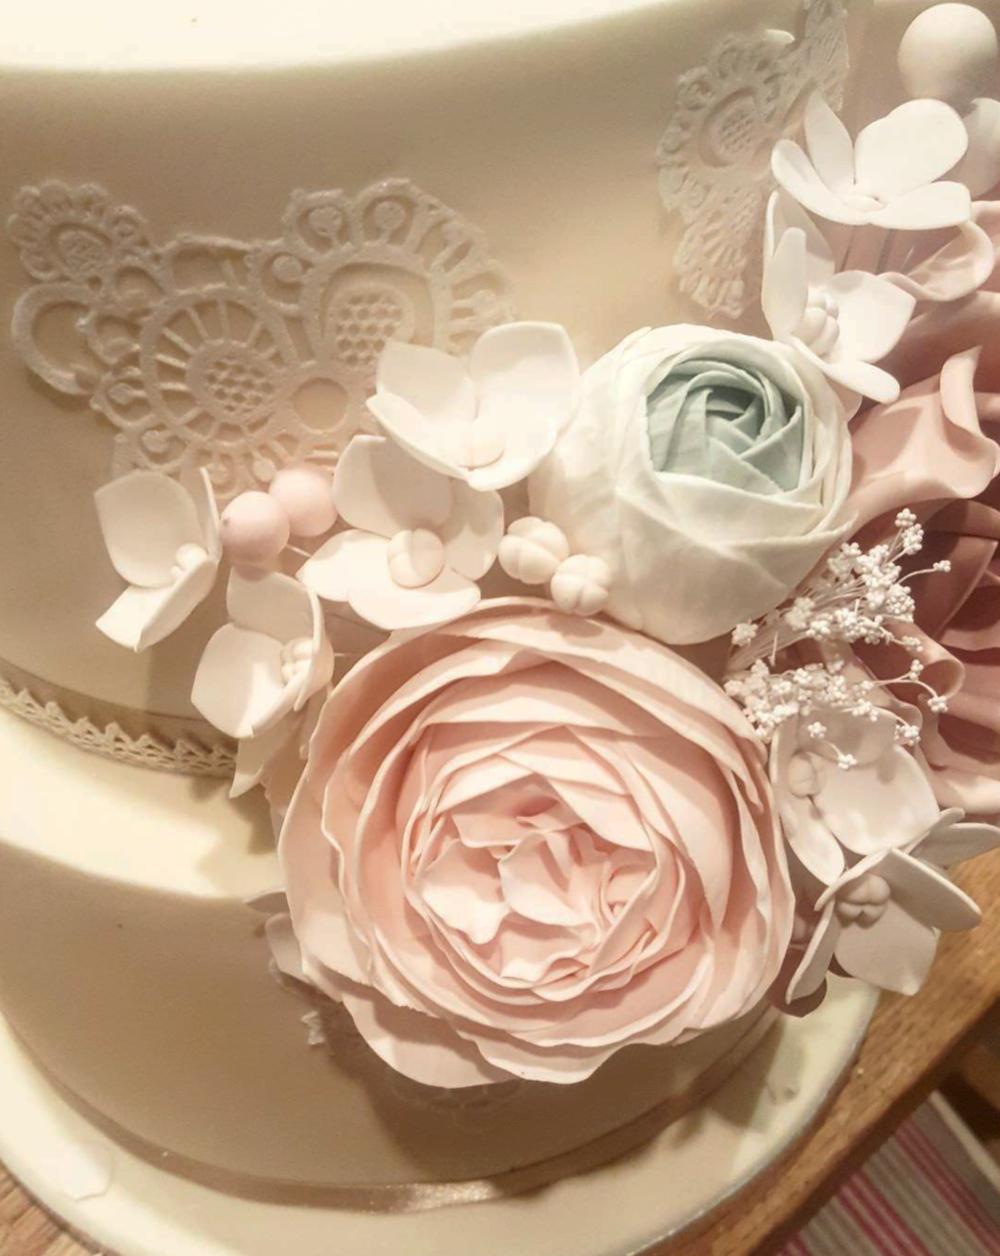 DOTTY ROSE CAKE DESIGN.png